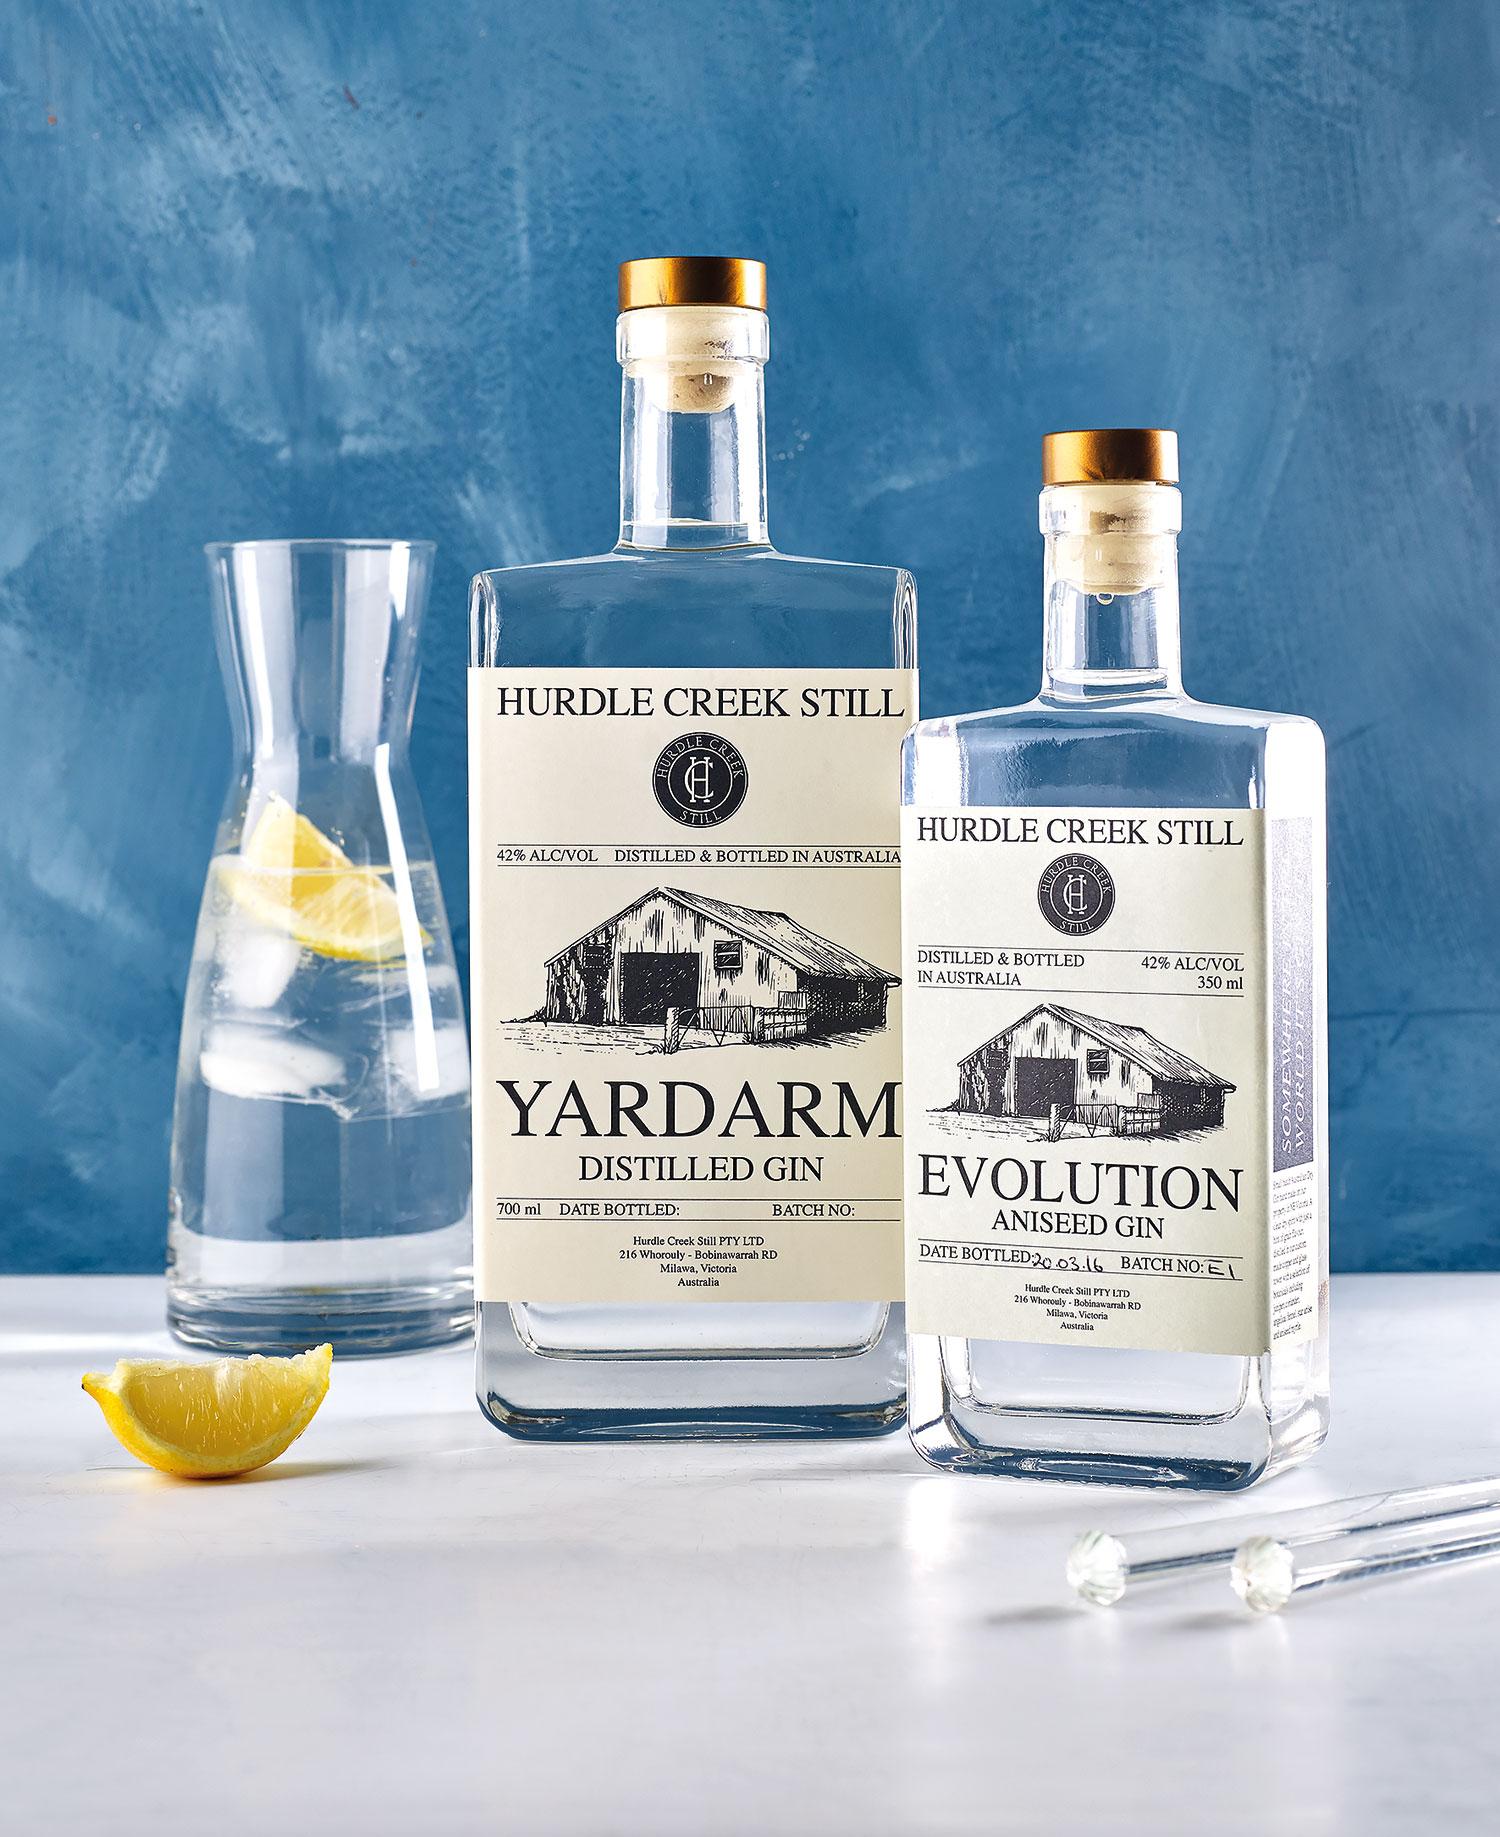 Hurdle Creek Gin